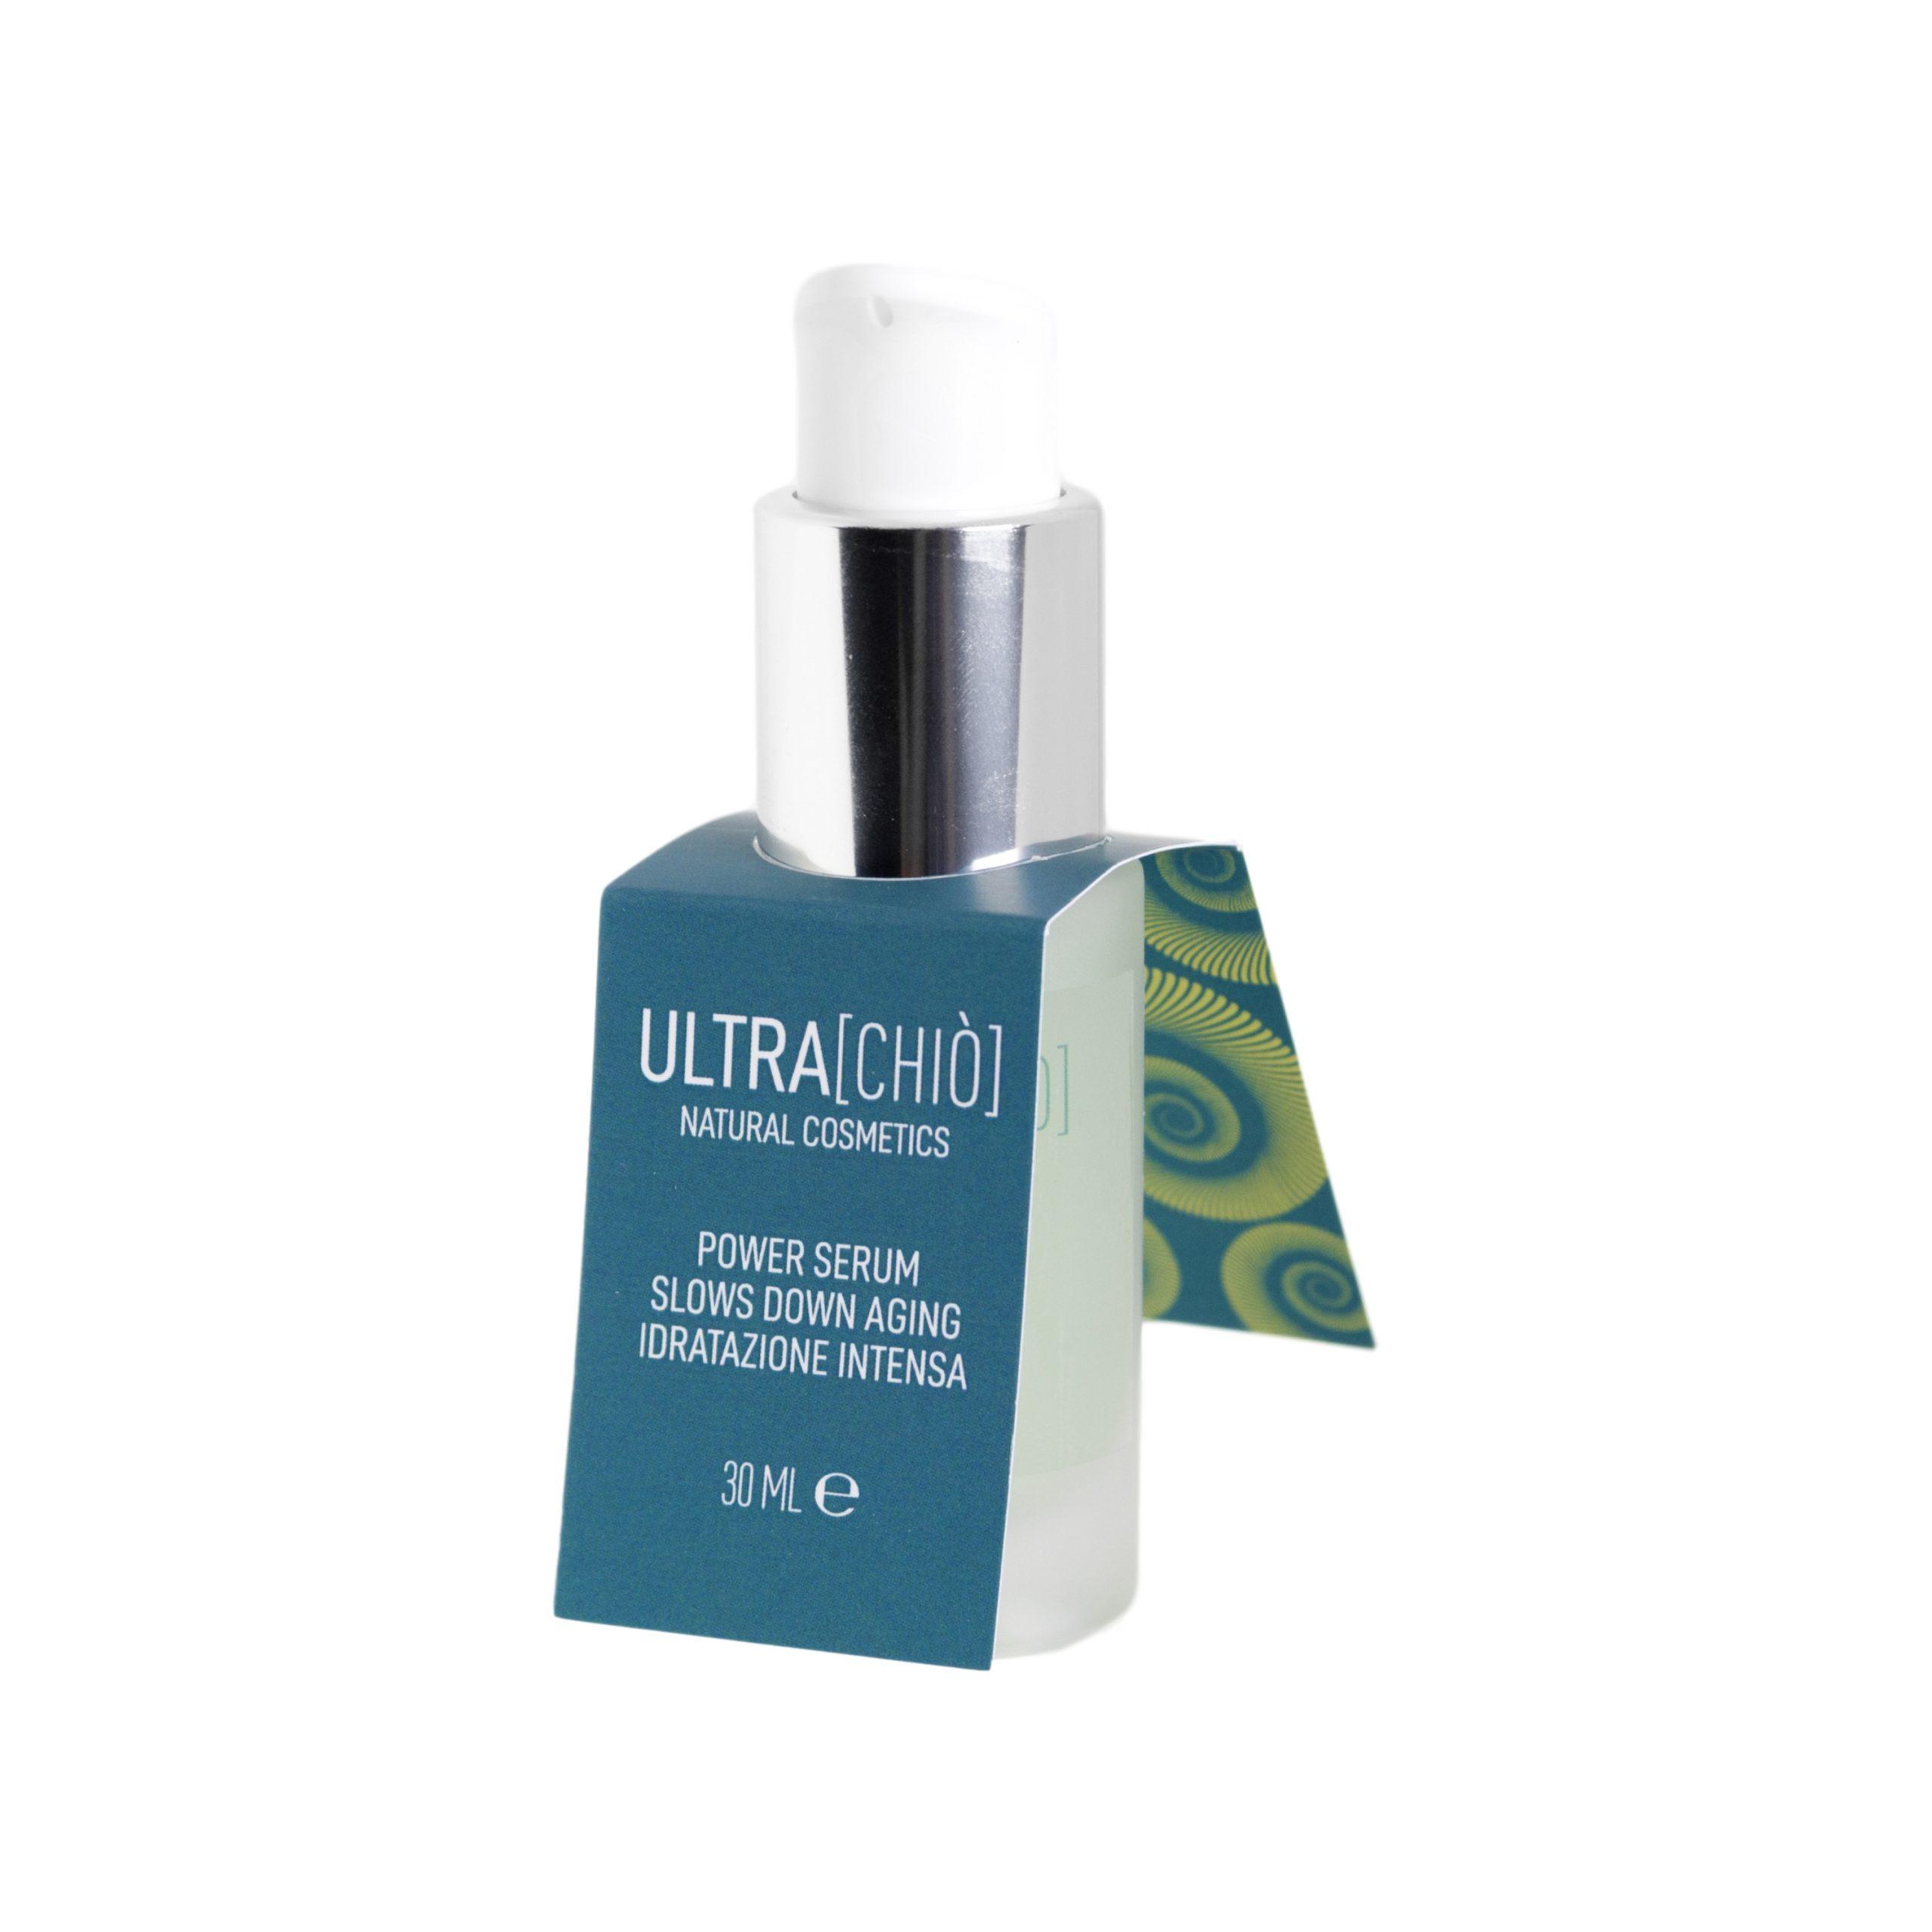 Ultra [chiò] – power serum